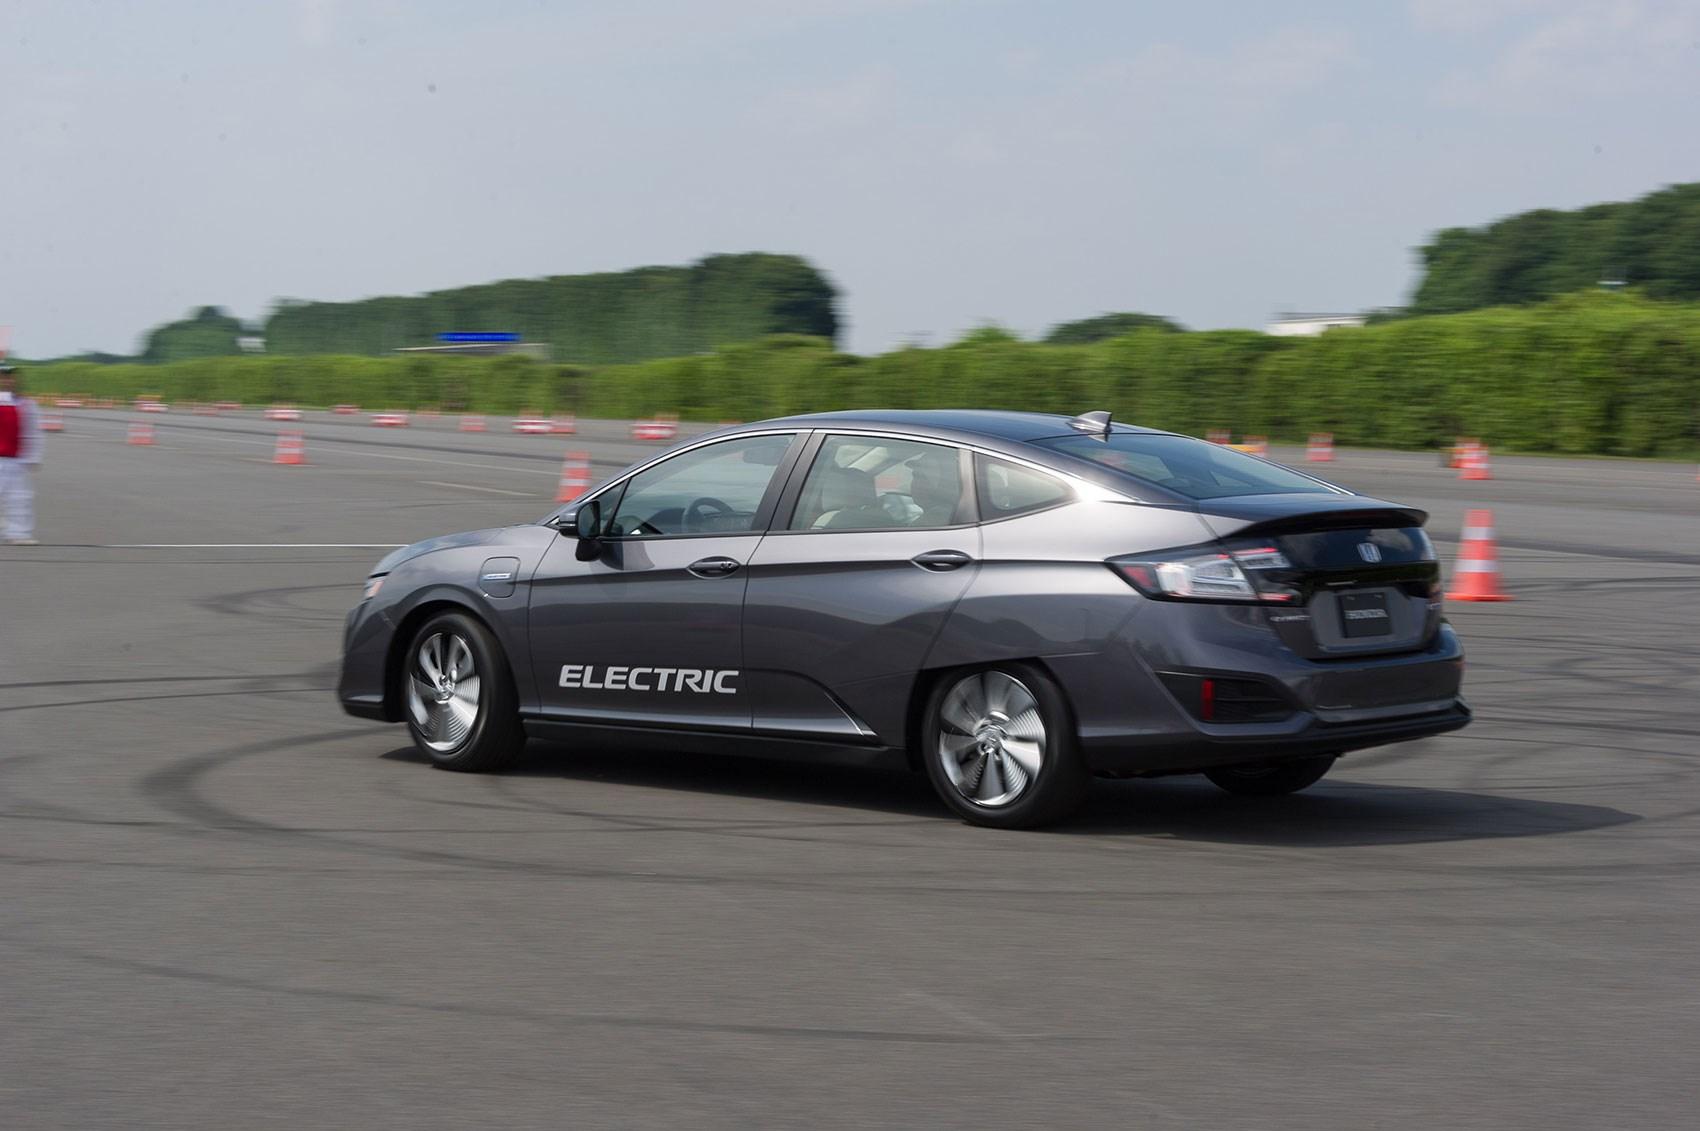 Hydrogen Cars Vs Electric Cars